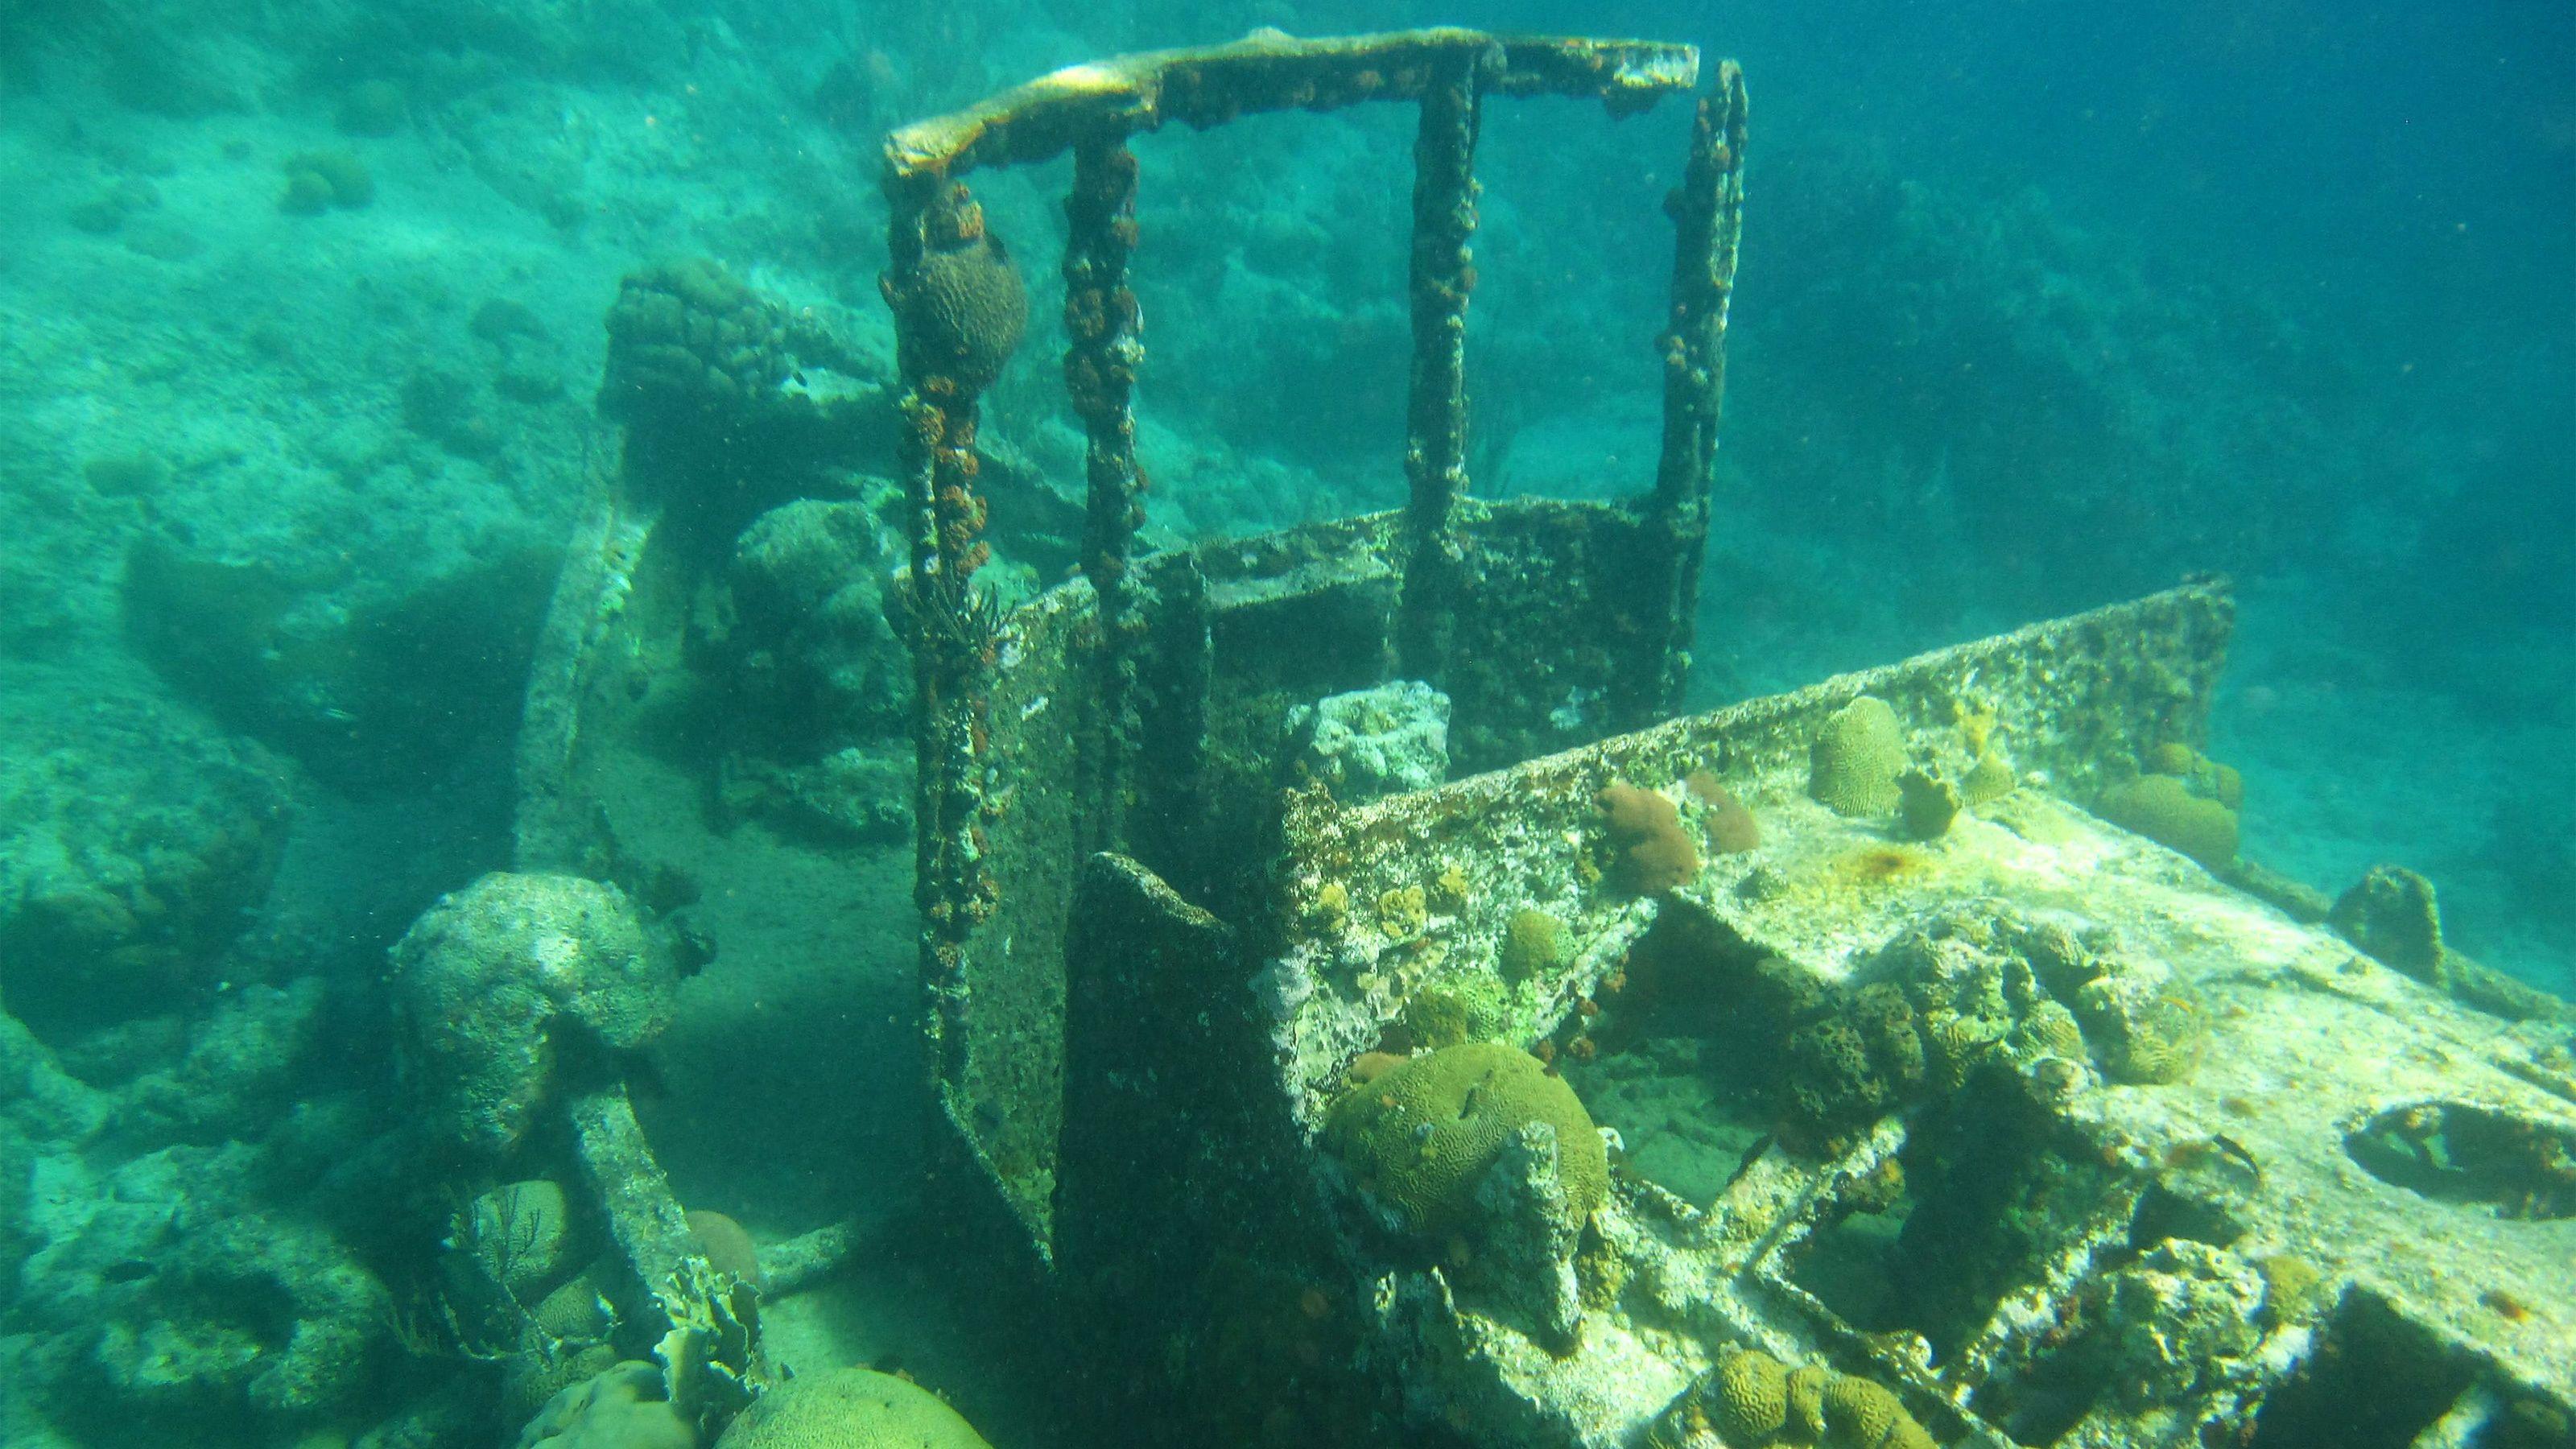 Tugboat & Reef Snorkel Tour